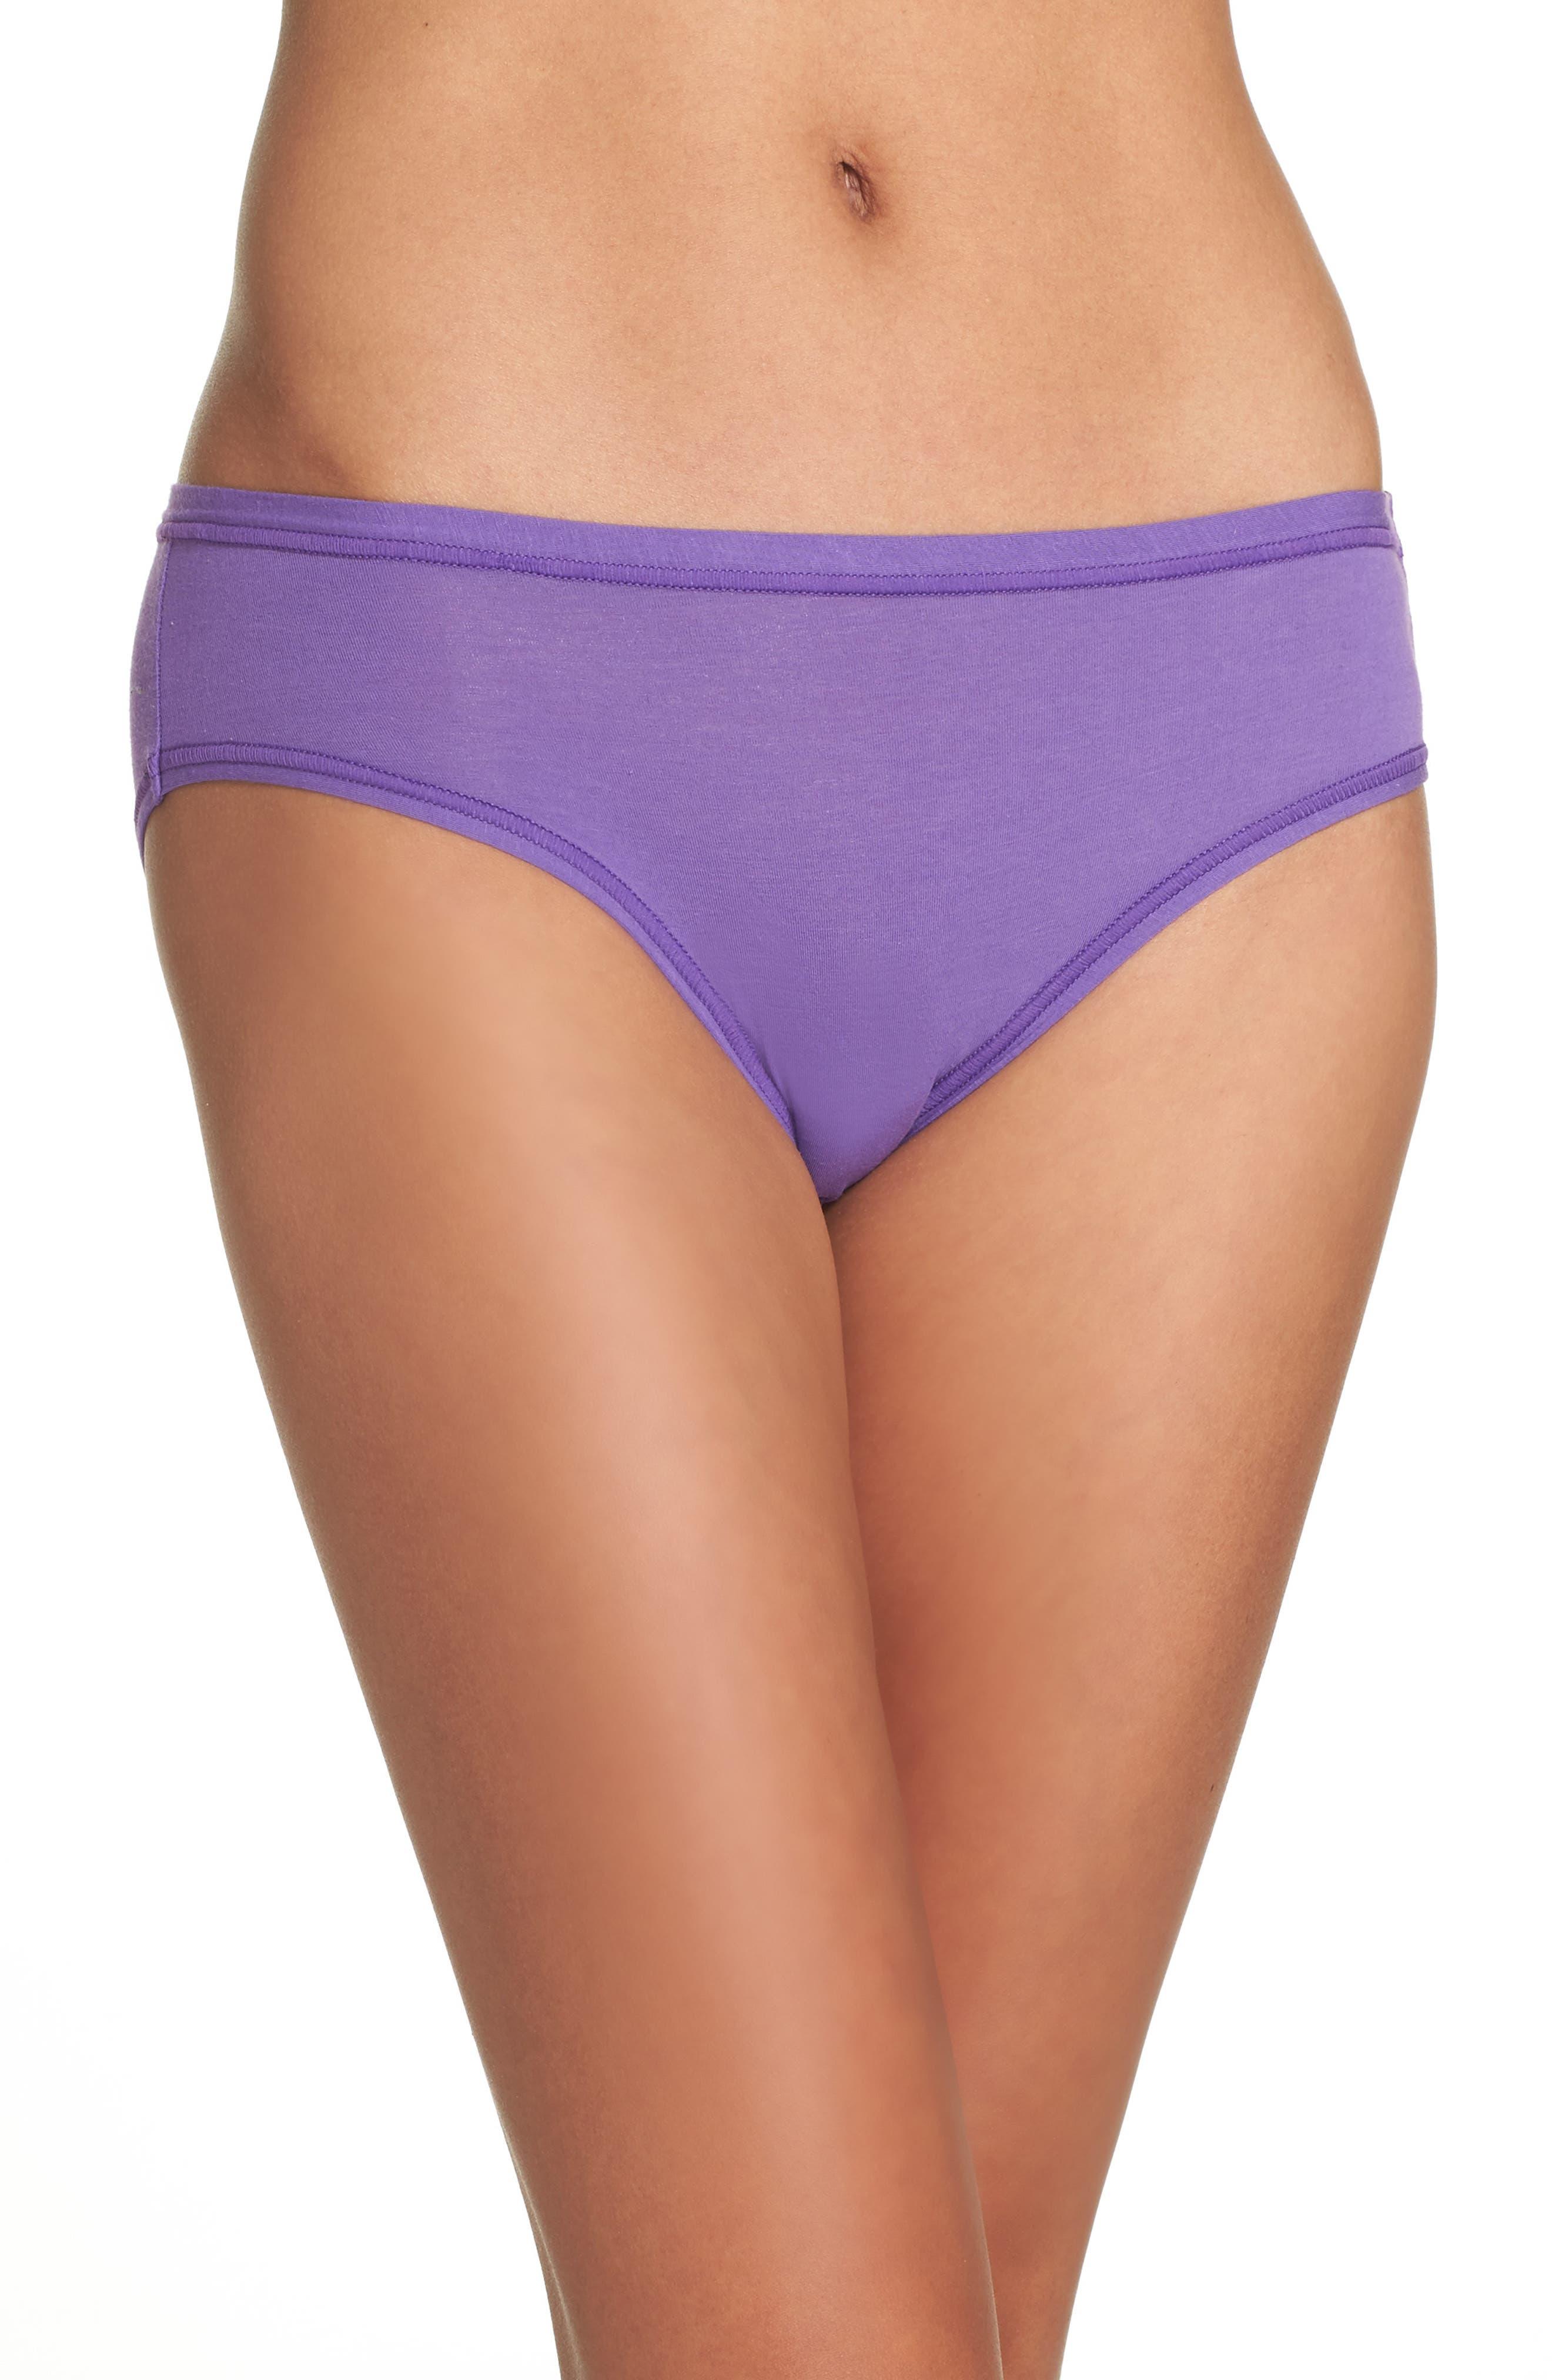 Alternate Image 1 Selected - Wacoal B Fitting Bikini (3 for $28)